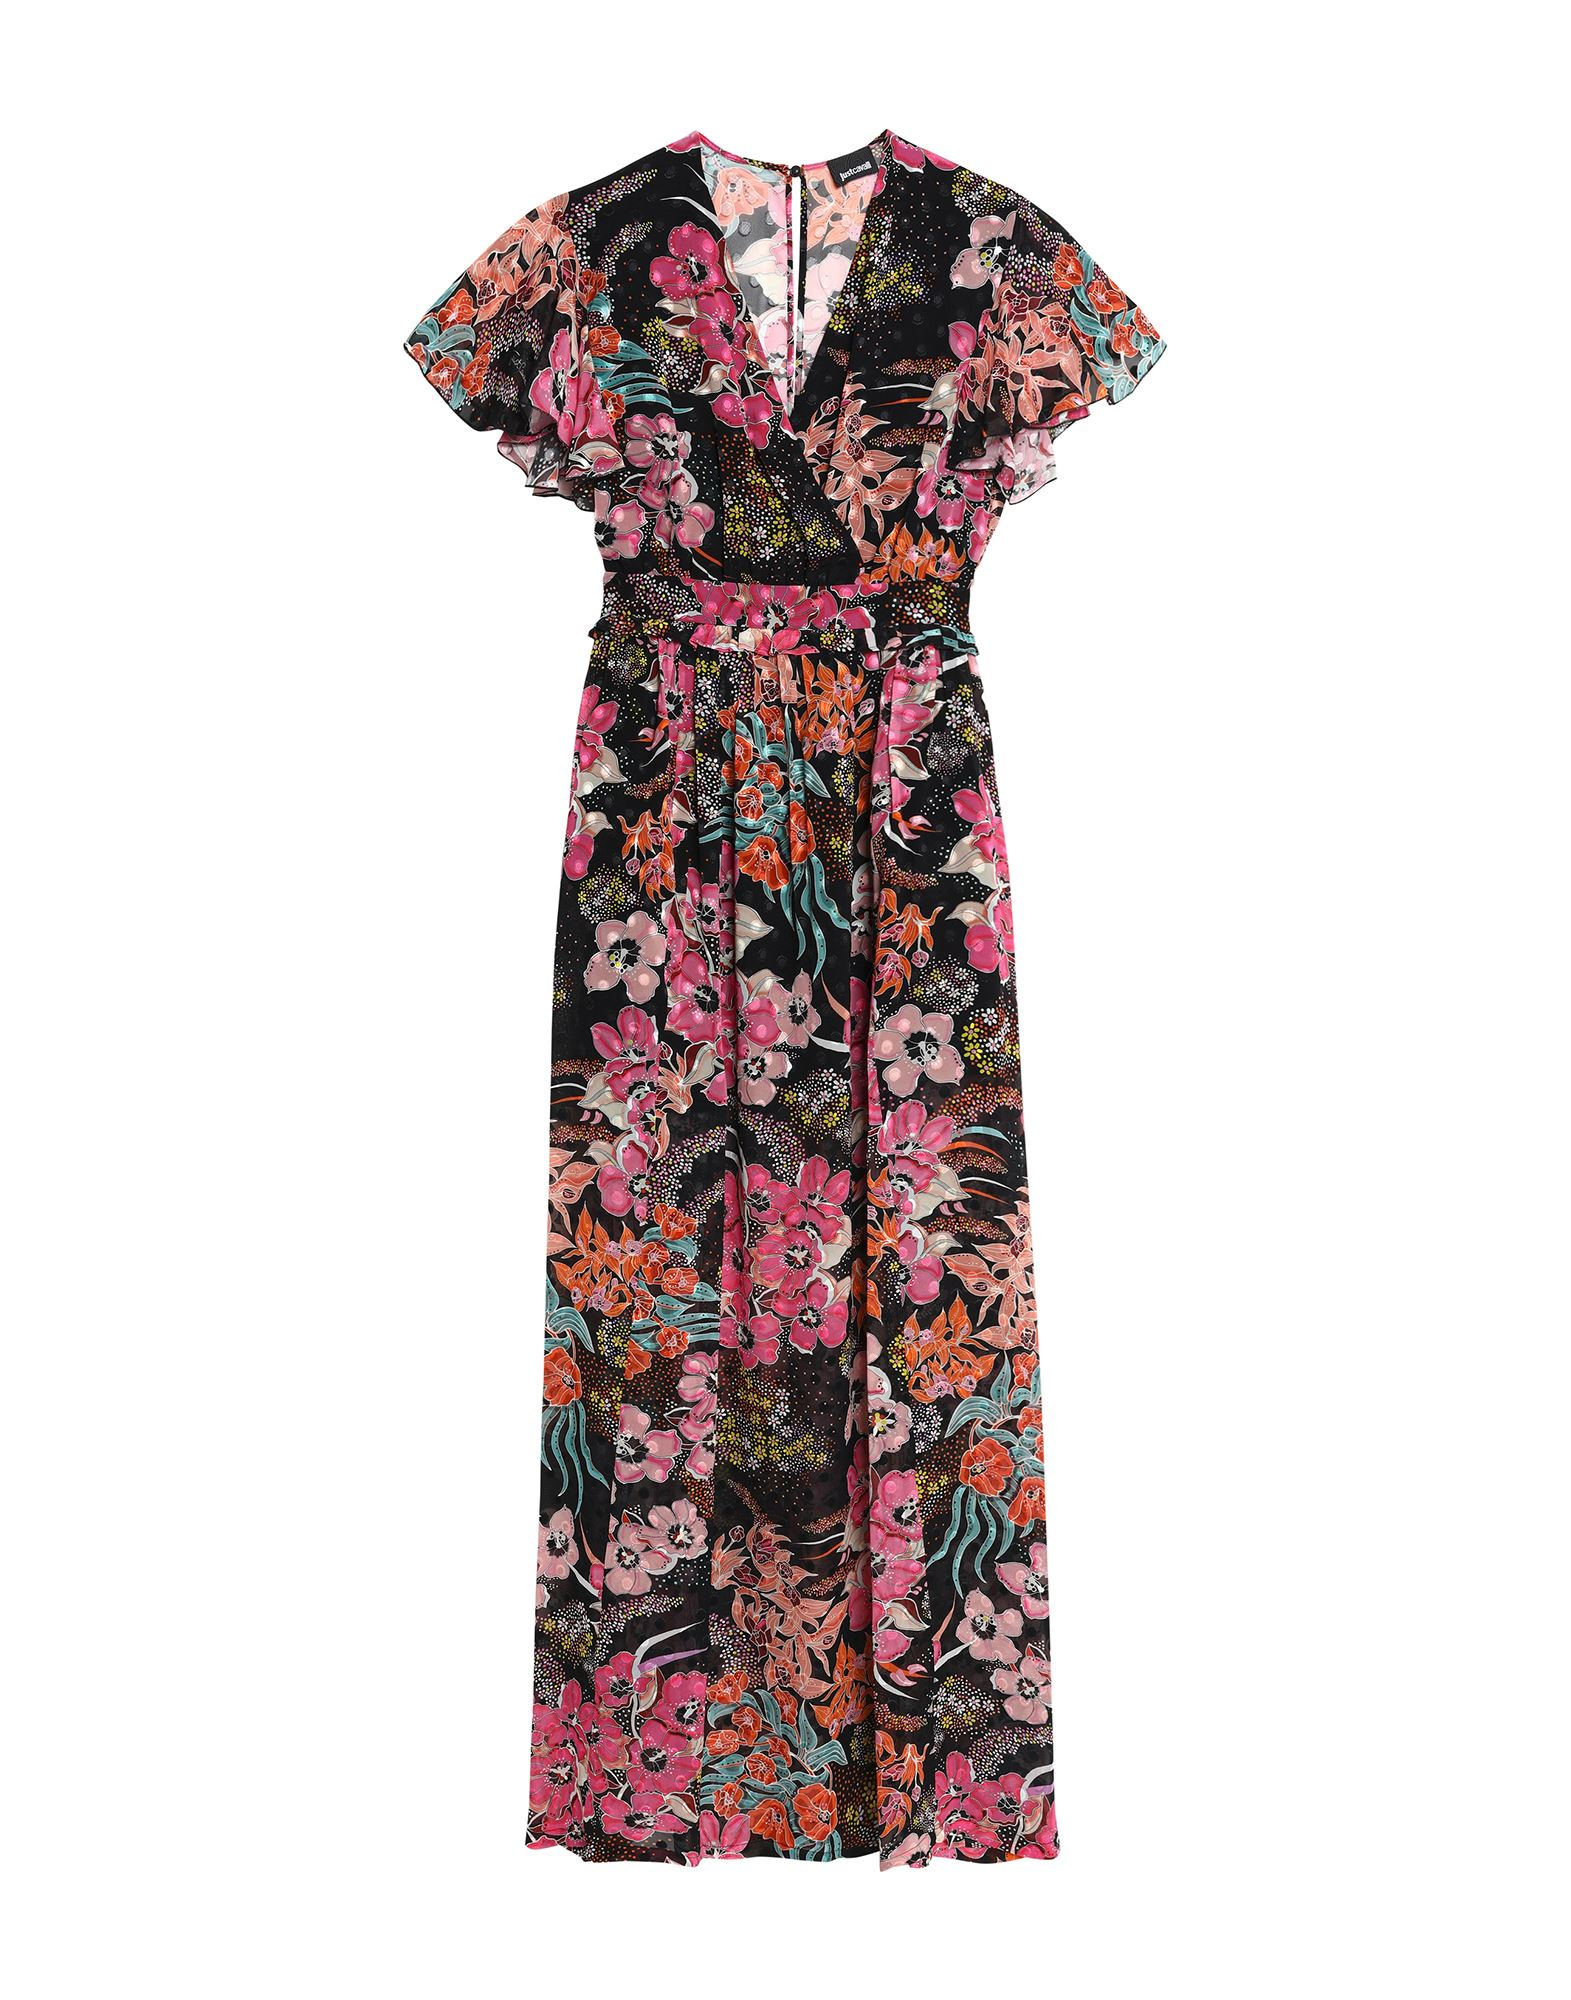 JUST CAVALLI | JUST CAVALLI Long Dresses 34822212 | Goxip